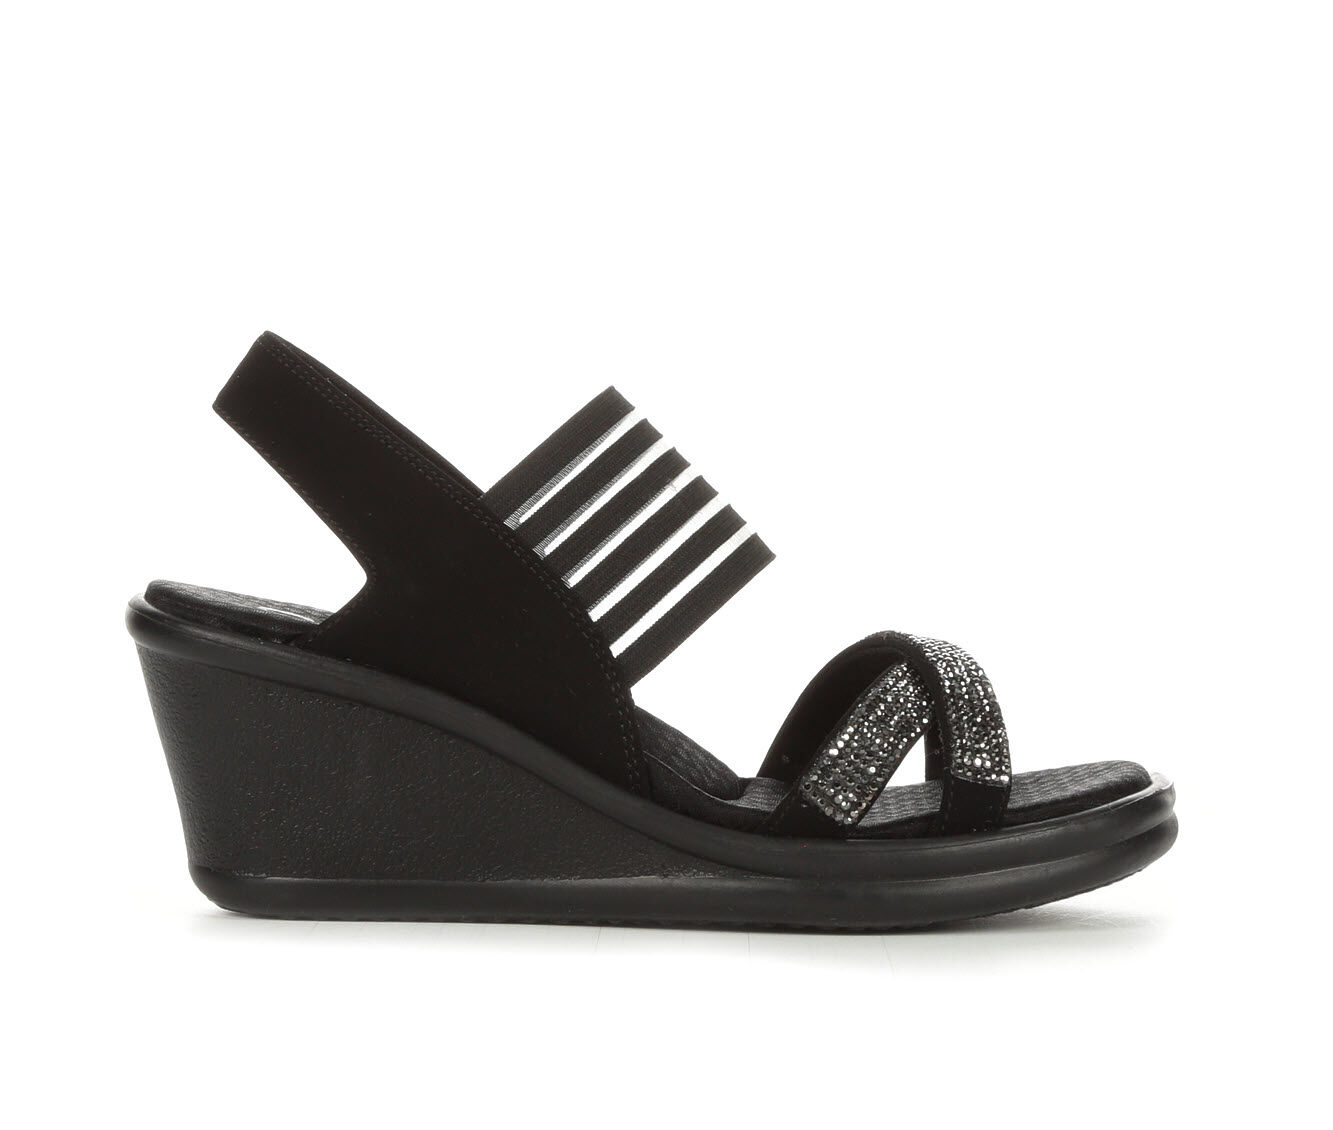 Women's Skechers Cali Rumblers Modern Maze Wedge Sandals Black